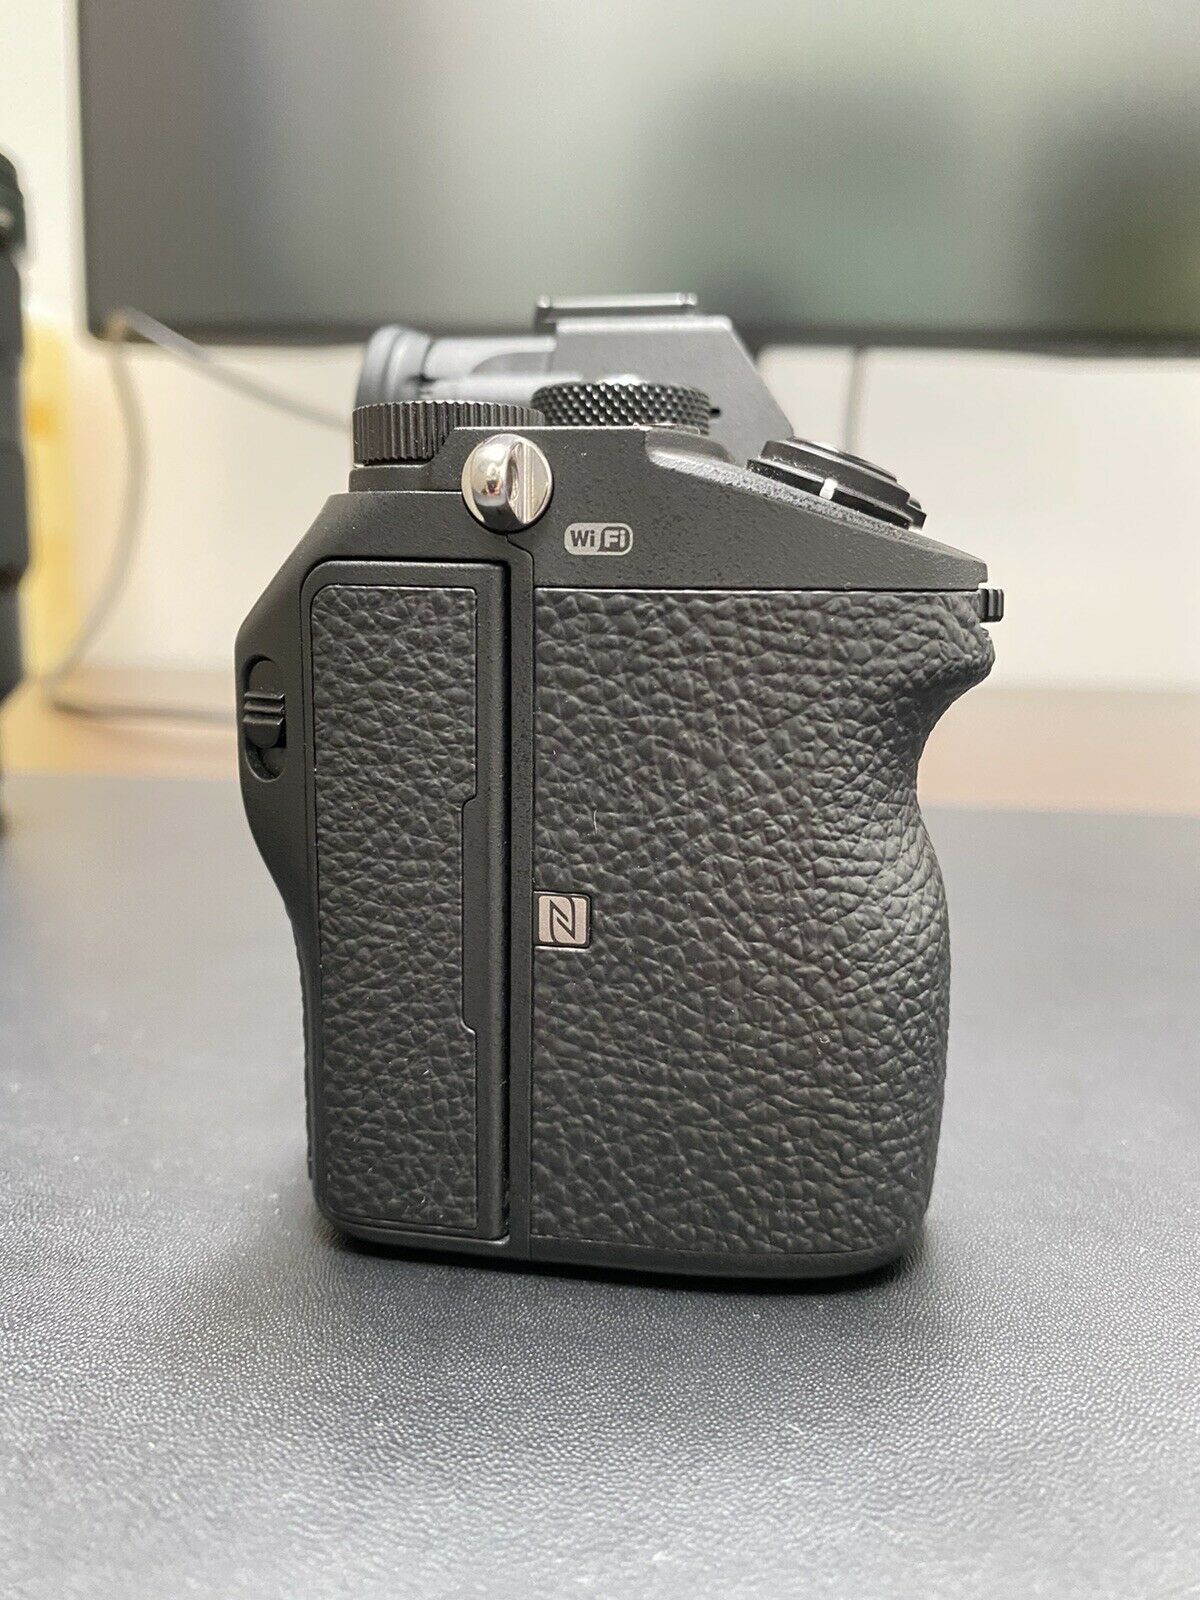 Sony A7 III 24.2 MP Mirrorless Digital camera